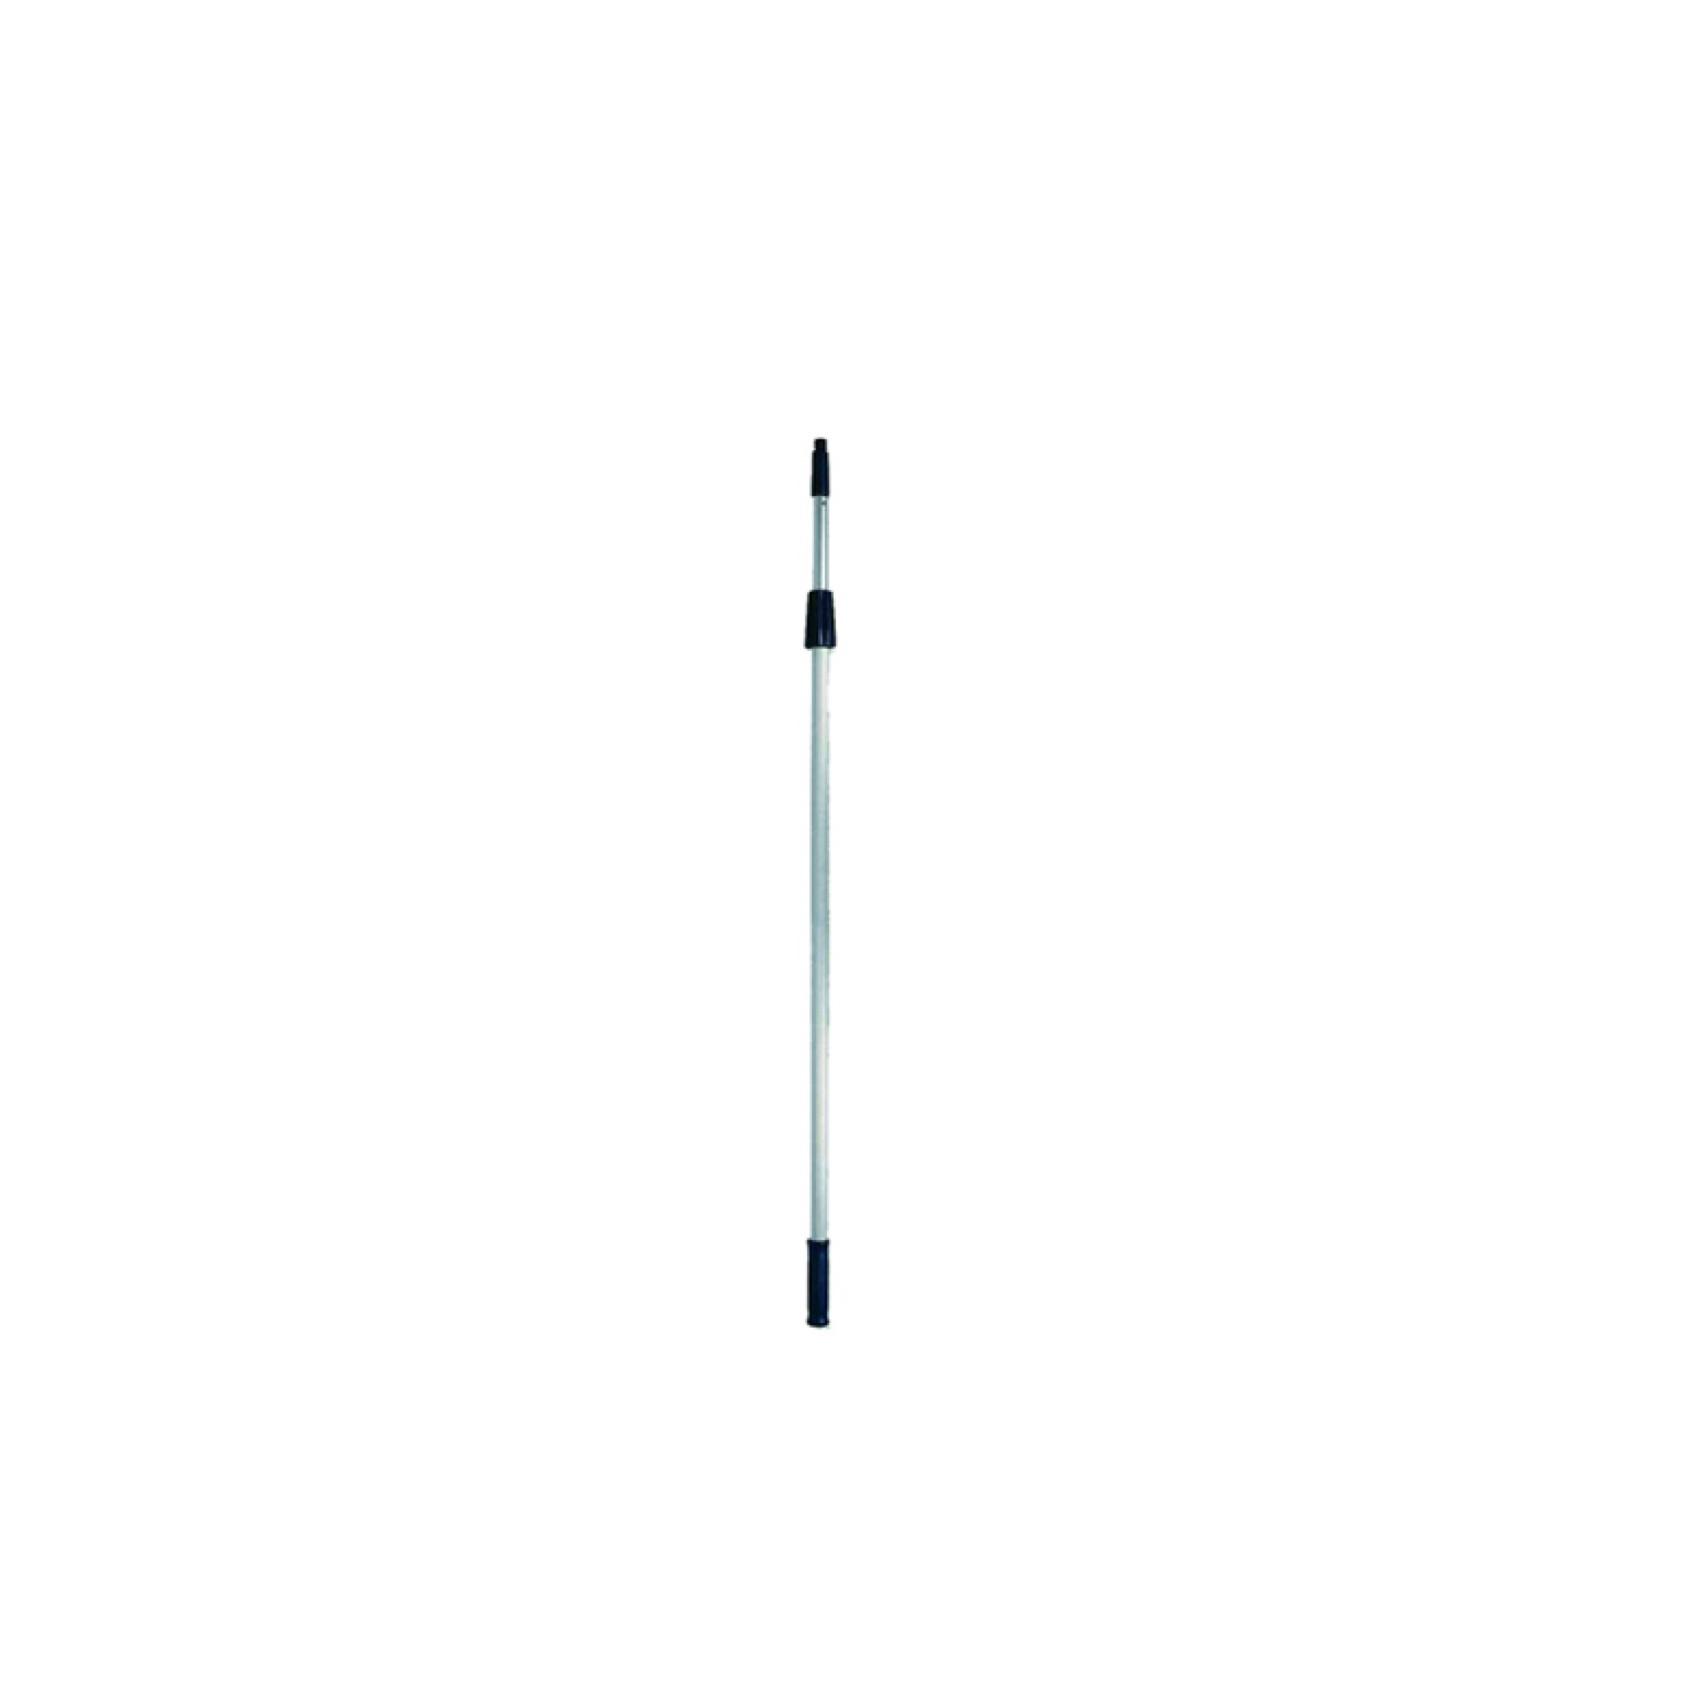 Teleskopska palica 2 x 0,60 cm